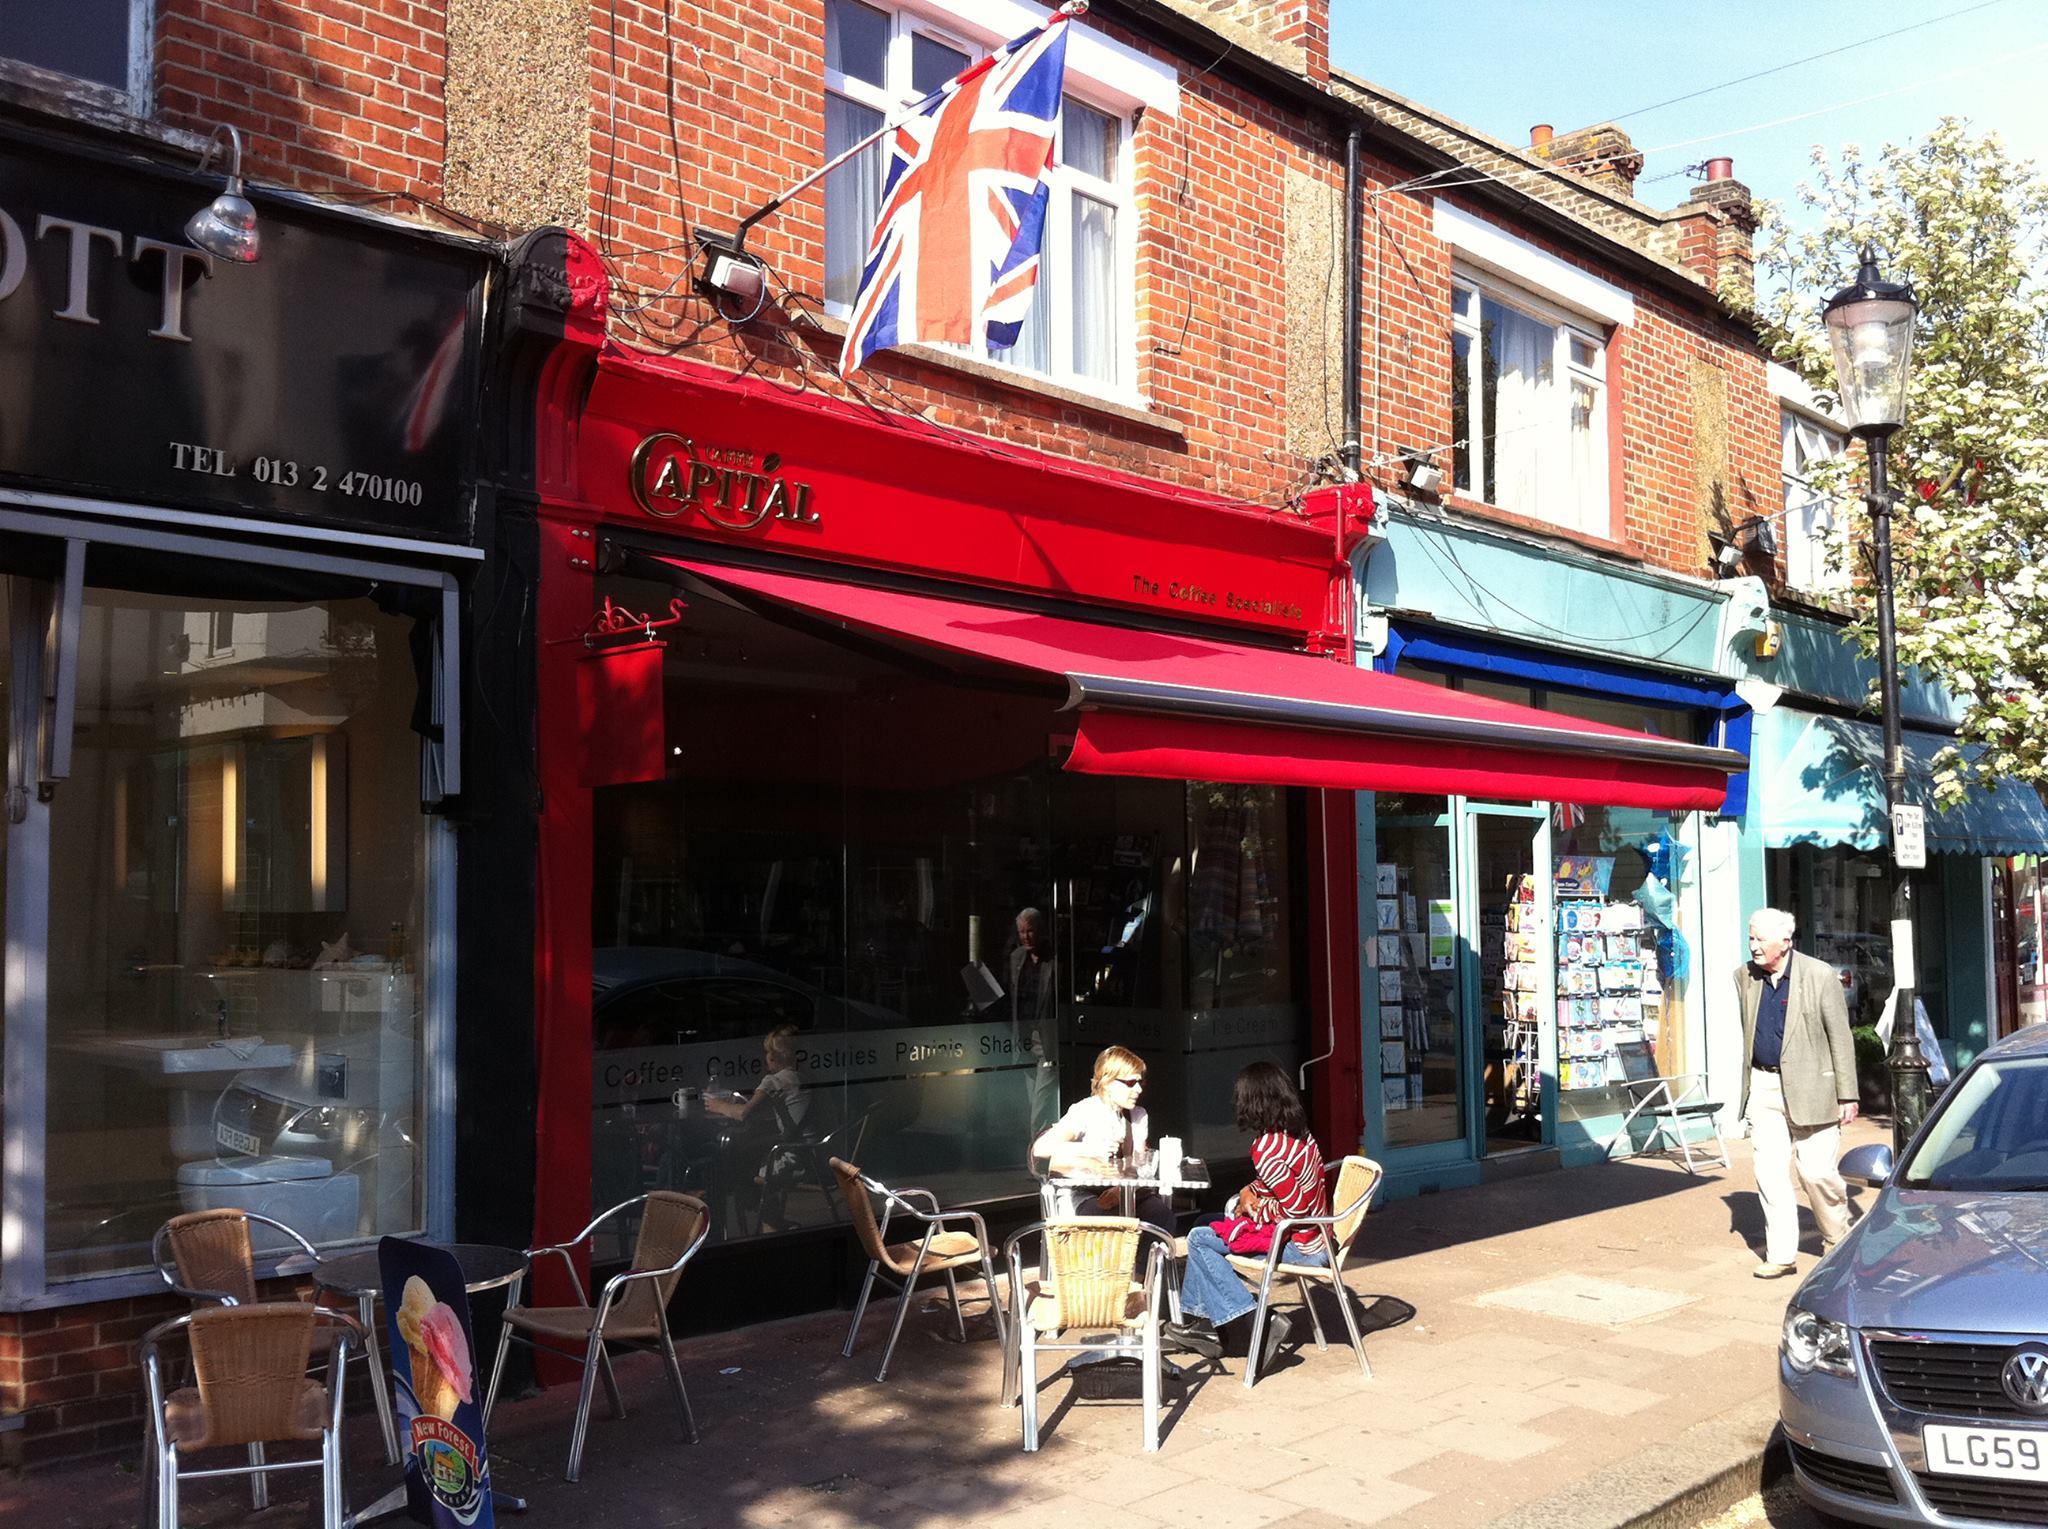 Caffe Capital - Best Coffee Shop